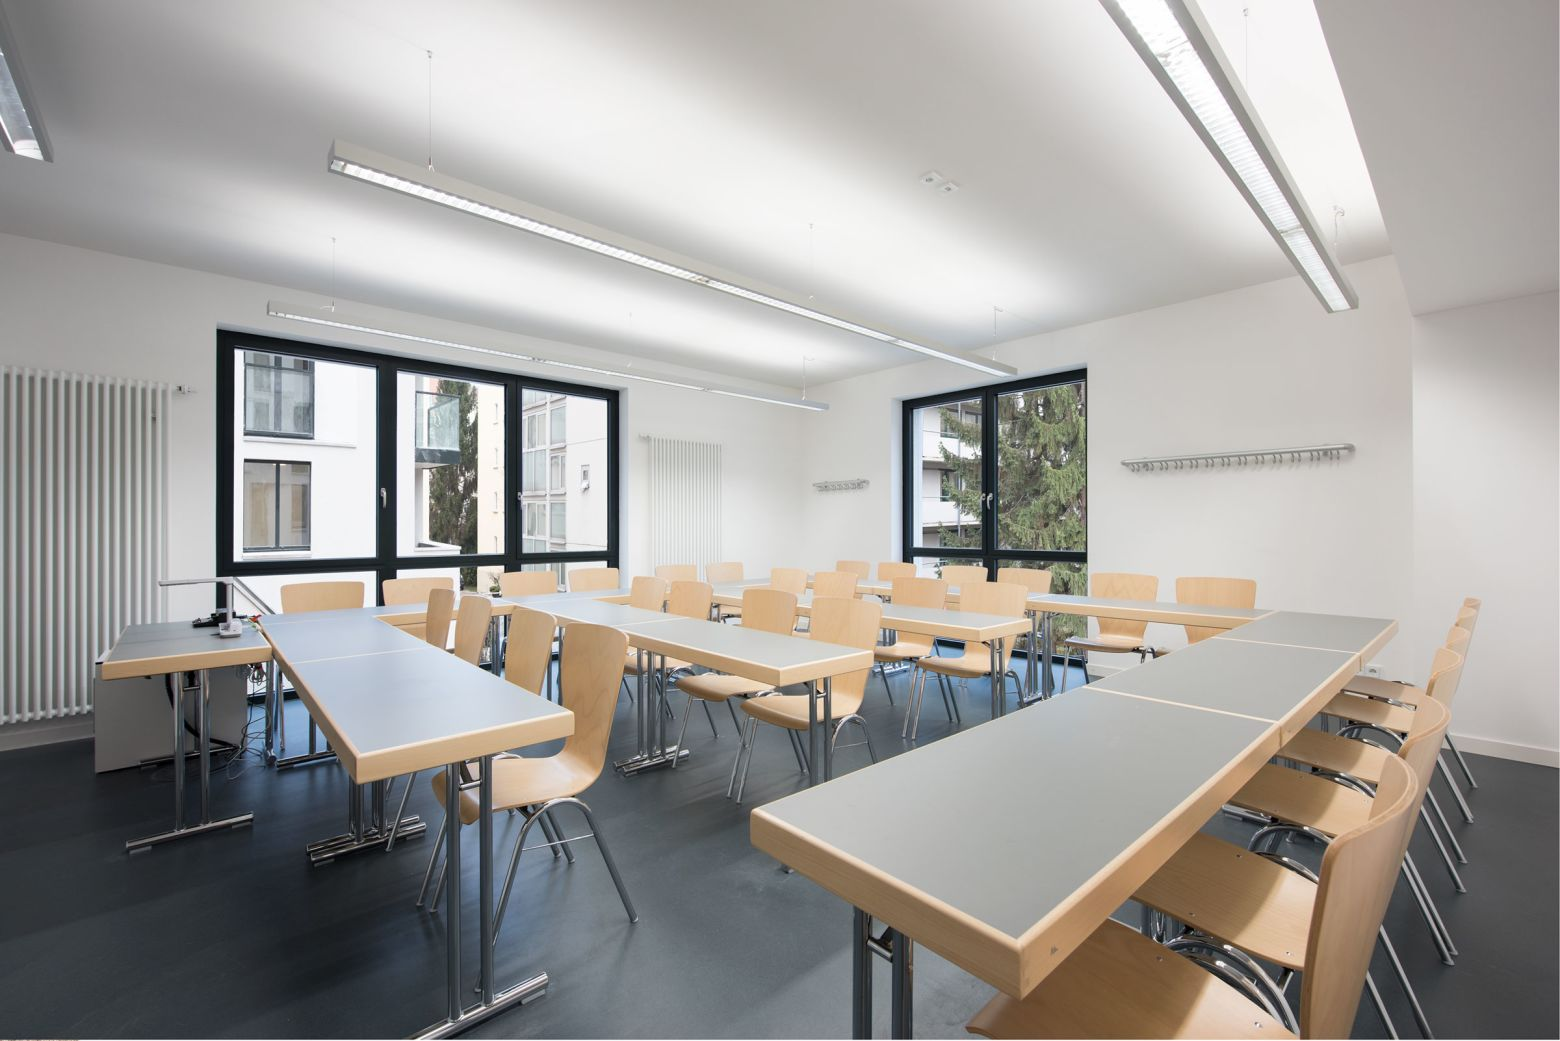 Sprachschule 8. Klassen Deutschkurse